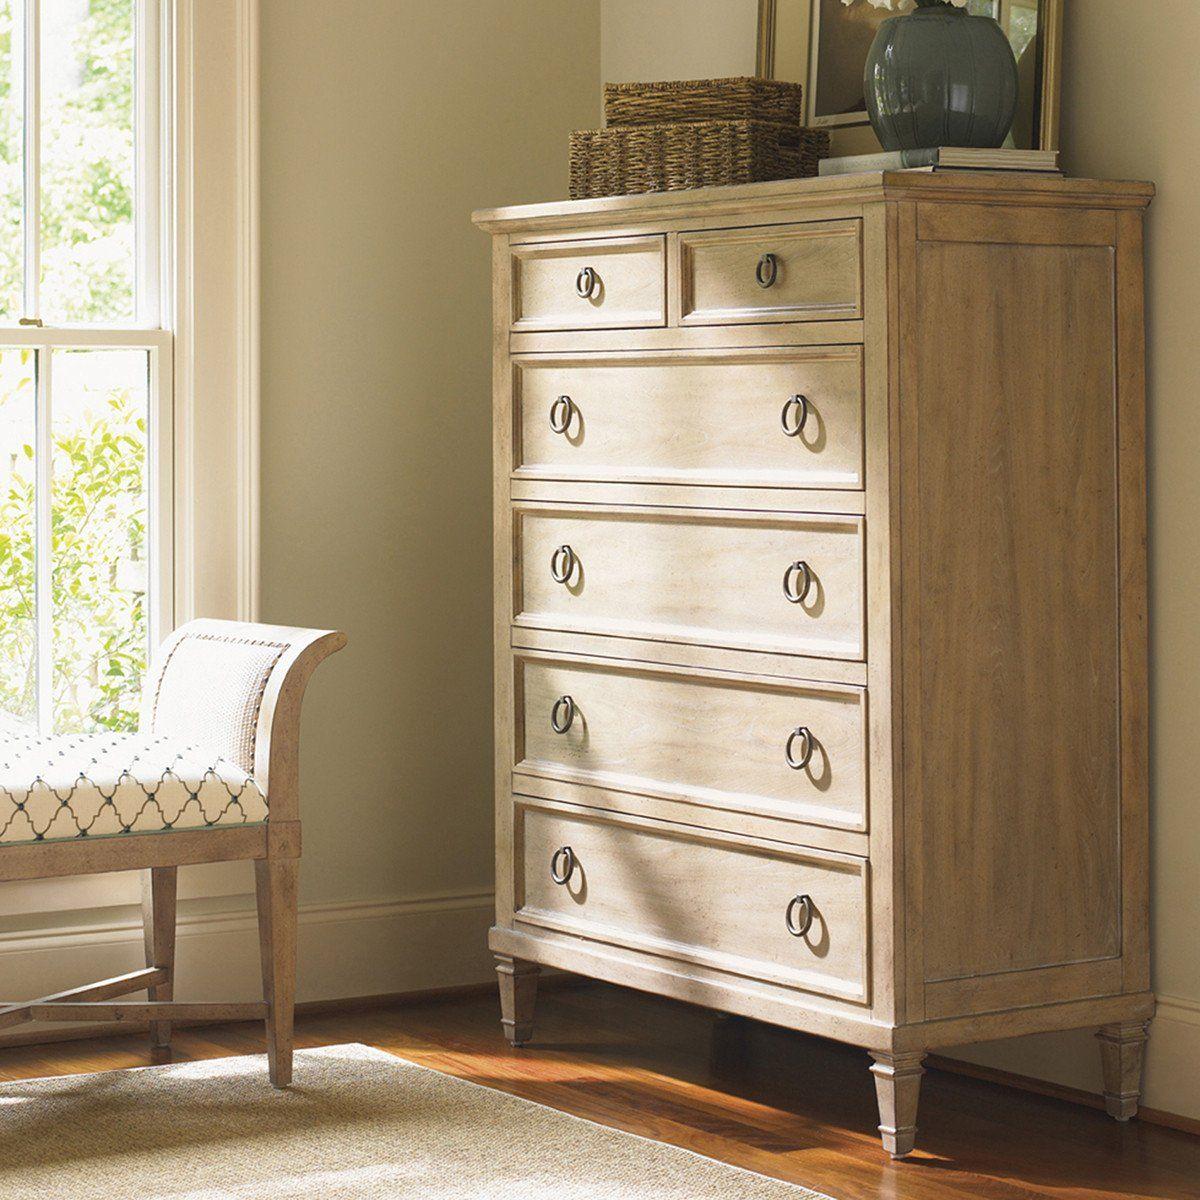 Lexington Monterey Sands Cabrillo Chest 6 drawer chest